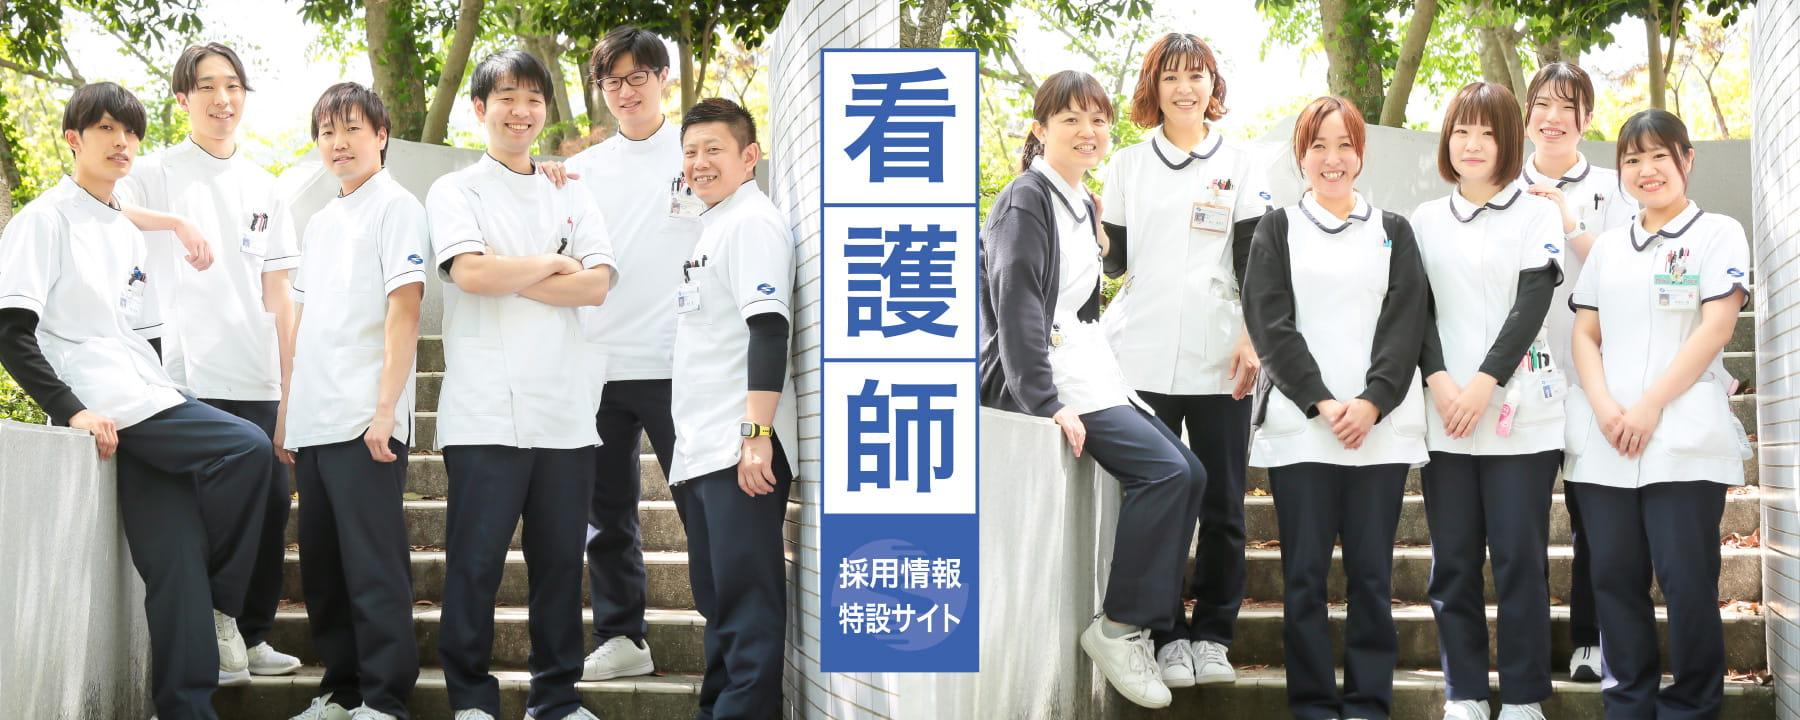 看護師 採用サイト|瀬野川病院